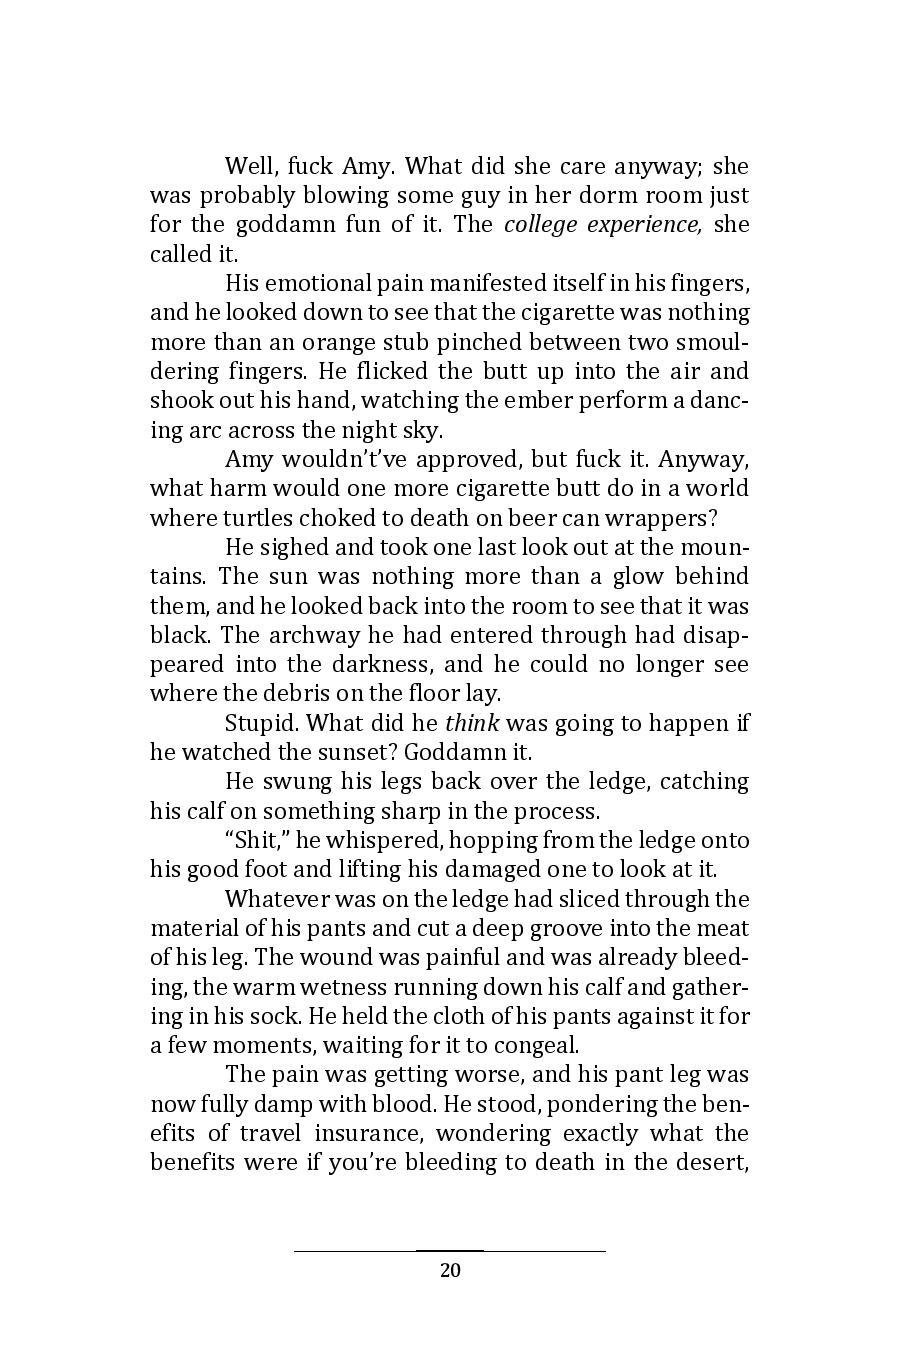 Hinnom Magazine 001 Manuscript 10-page-024